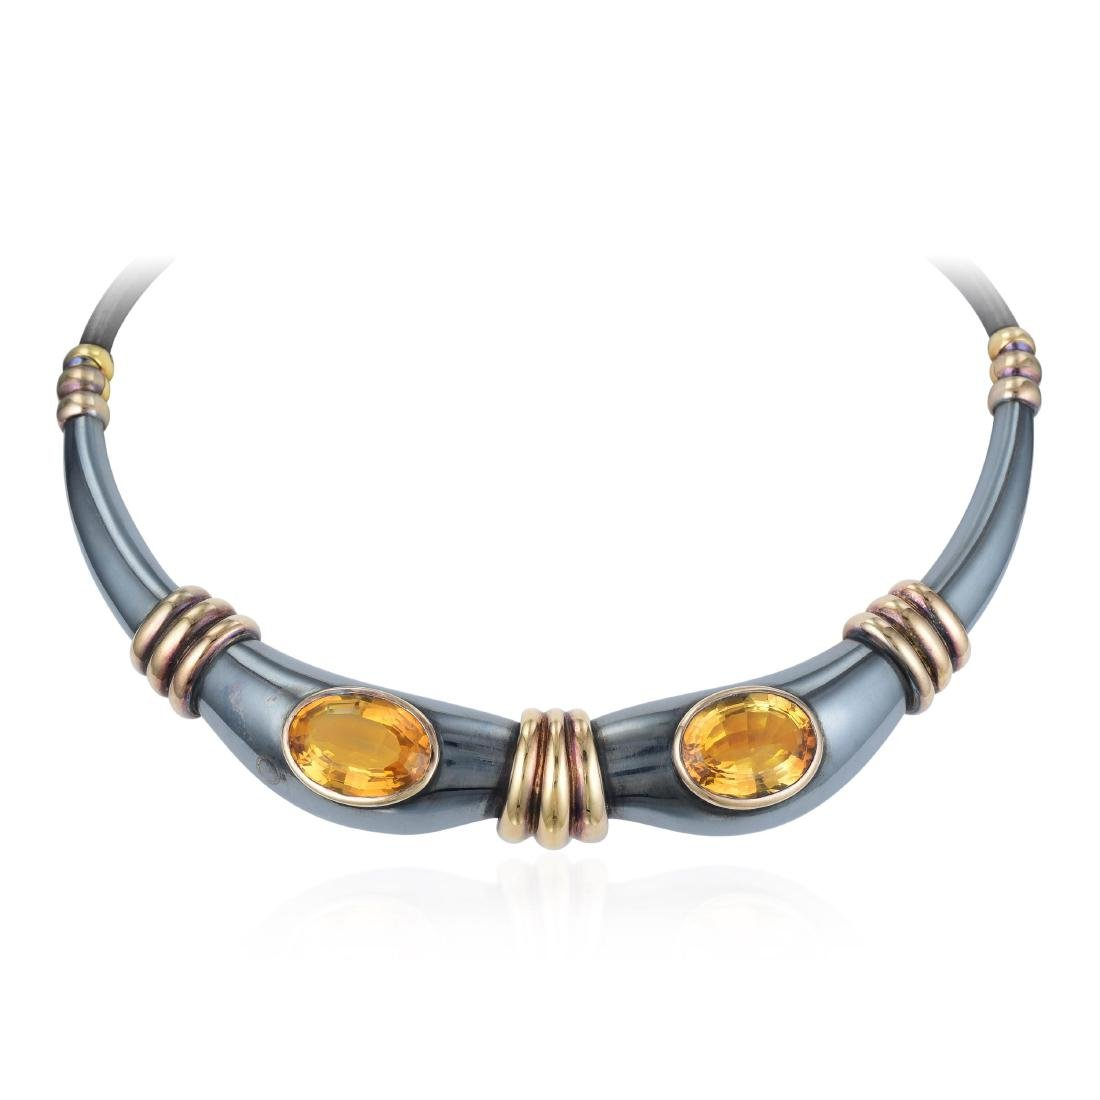 Rene Boivin Citrine Choker Necklace - 2